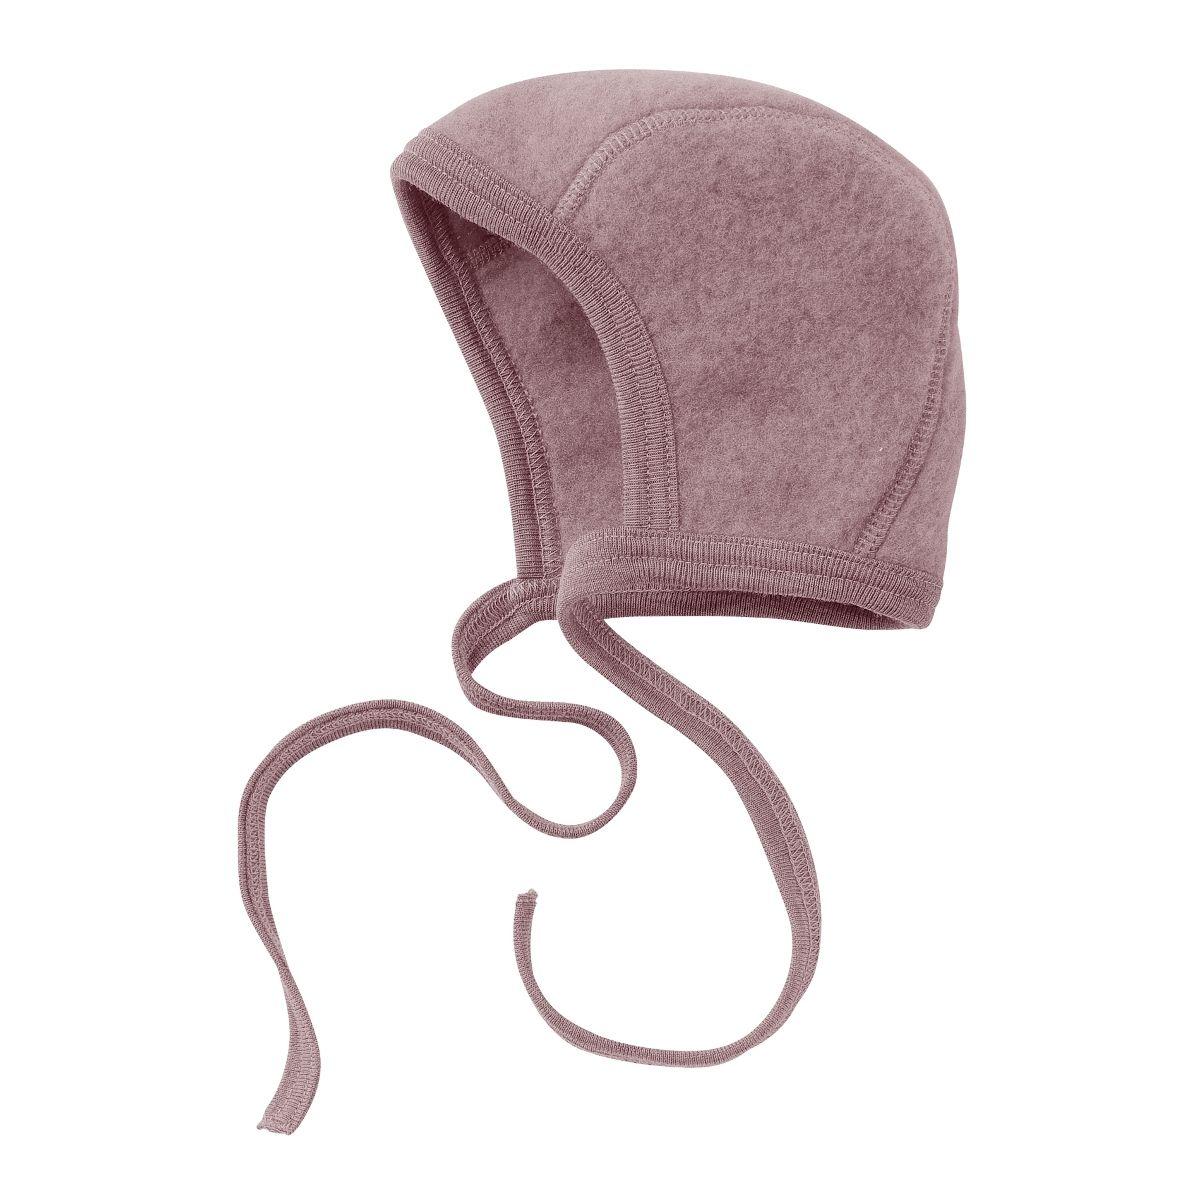 ENGEL Baby bonnet lilac